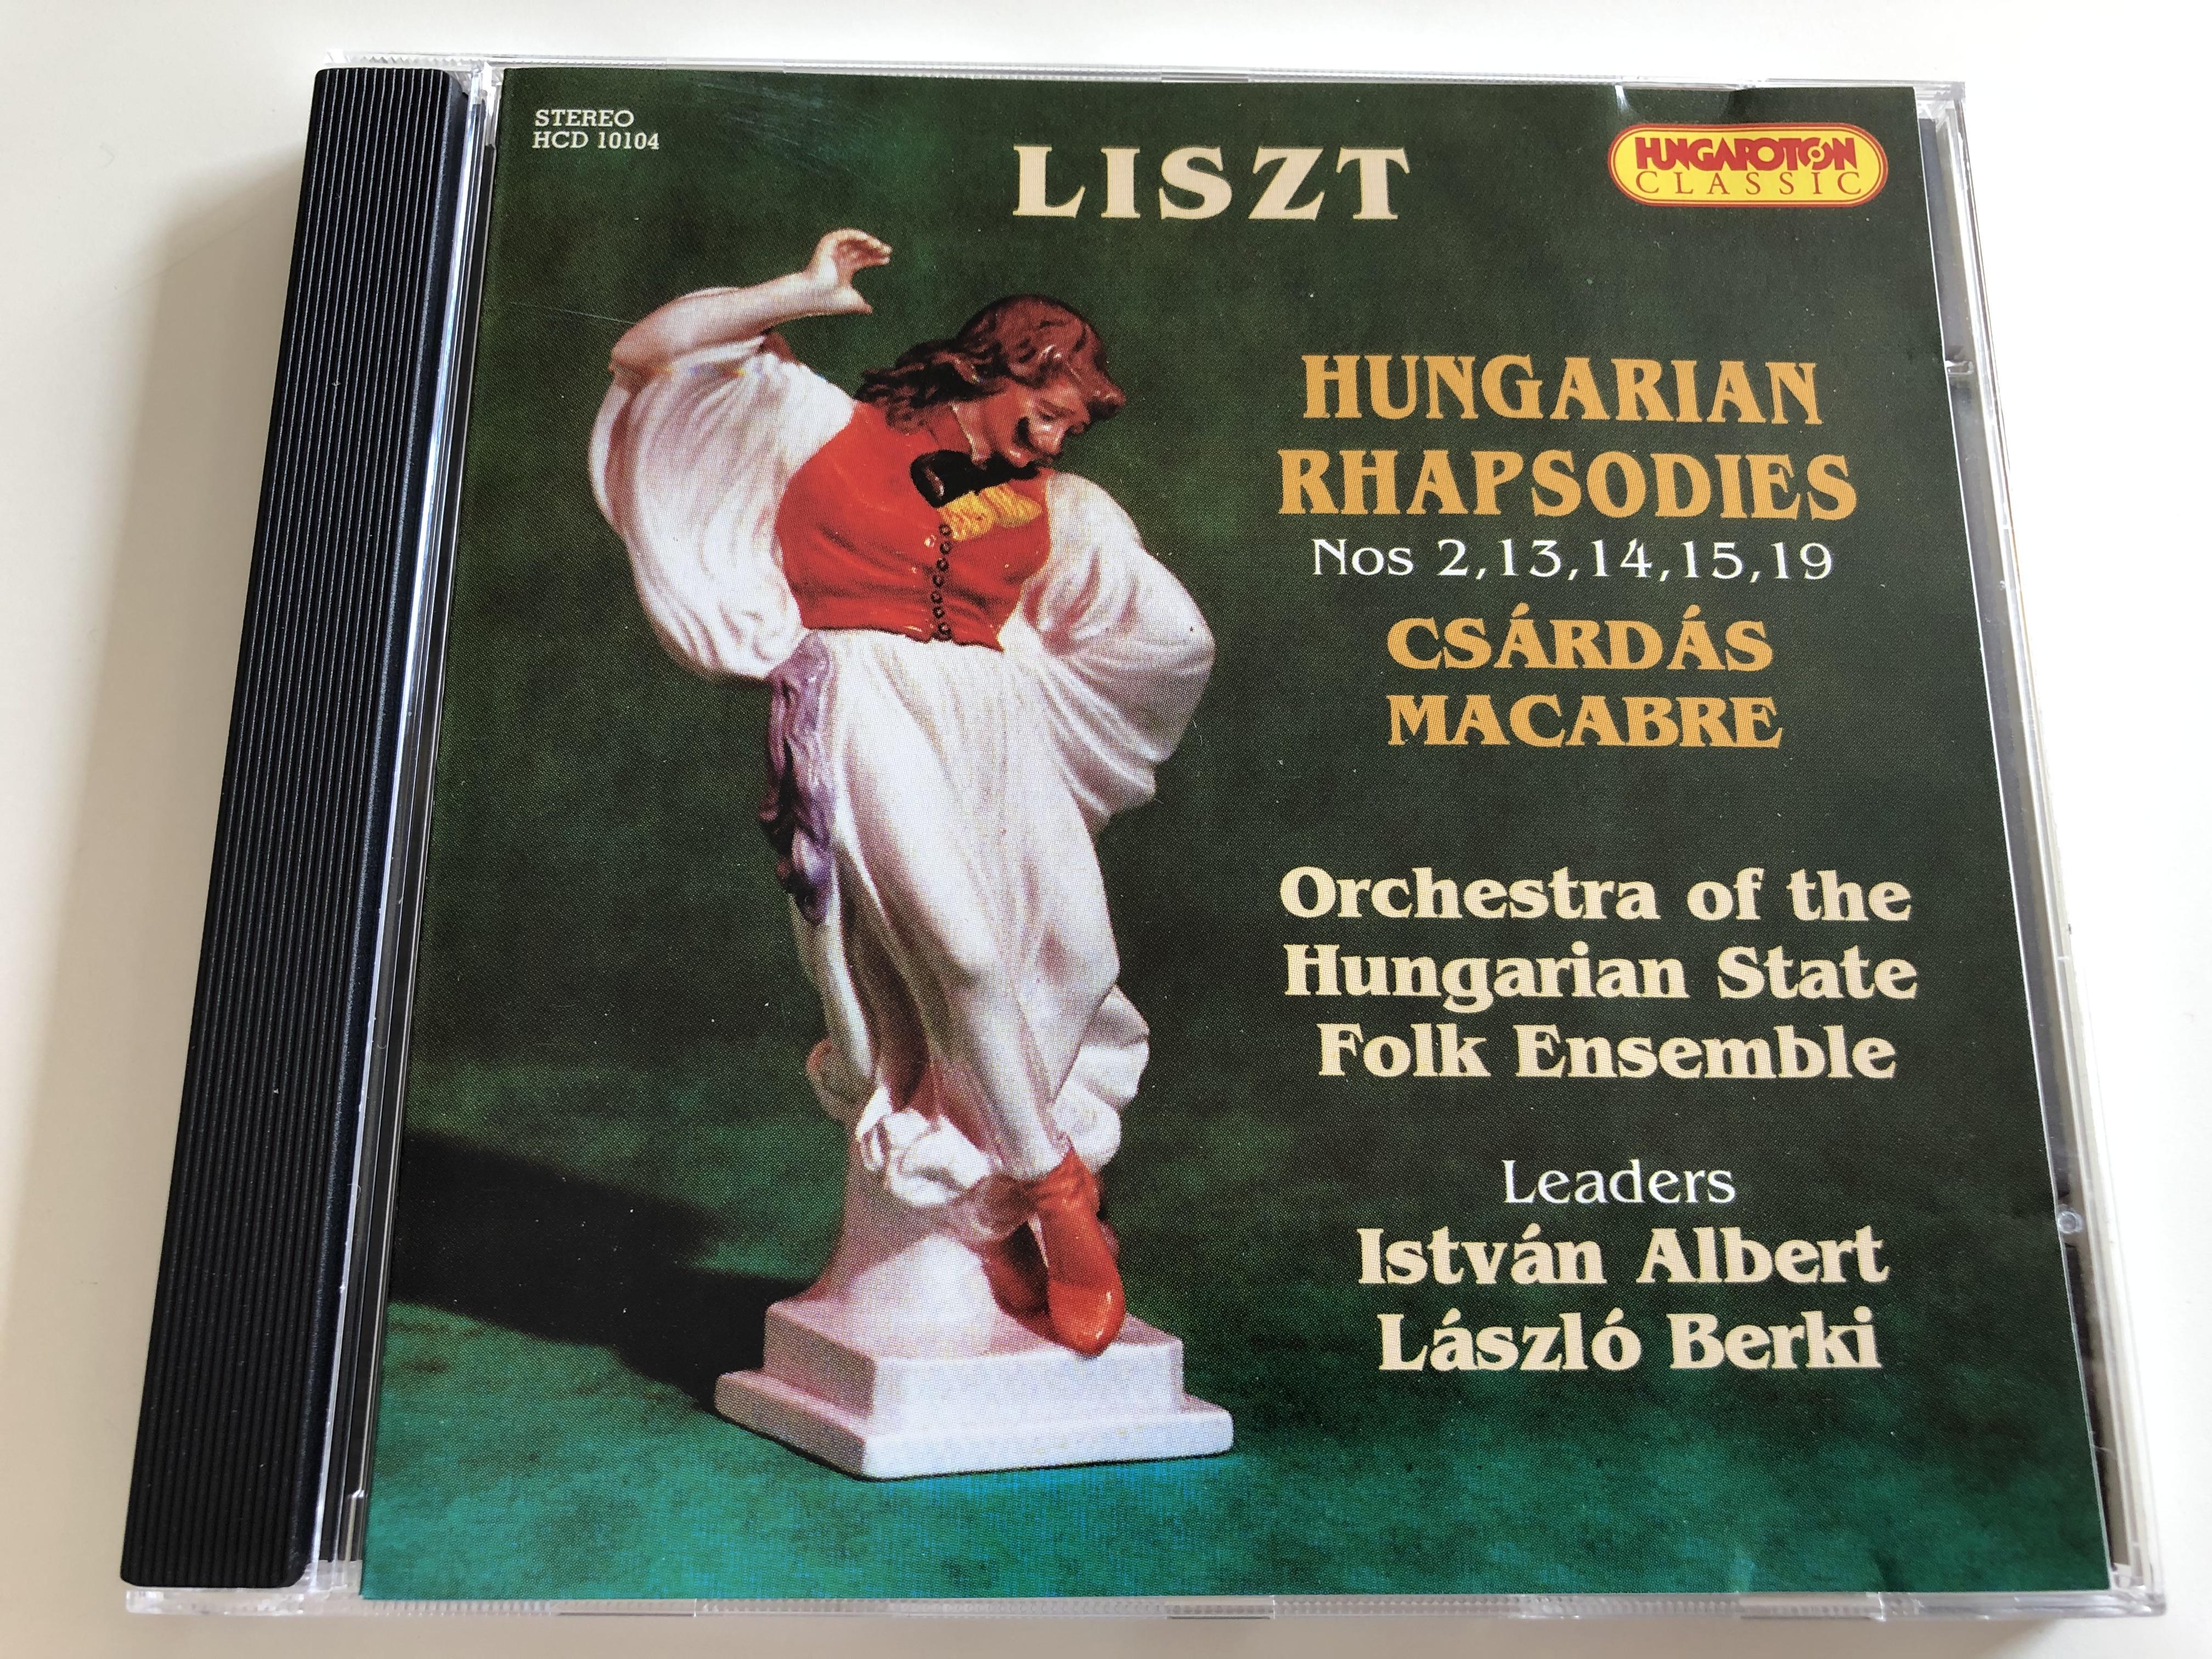 liszt-hungarian-rhapsodies-nos-2-13-14-15-19-cs-rd-s-macabre-orchestra-of-the-hungarian-state-folk-ensemble-leaders-istv-n-albert-l-szl-berki-hungaroton-classic-hcd-10104-audio-cd-1998-1-.jpg